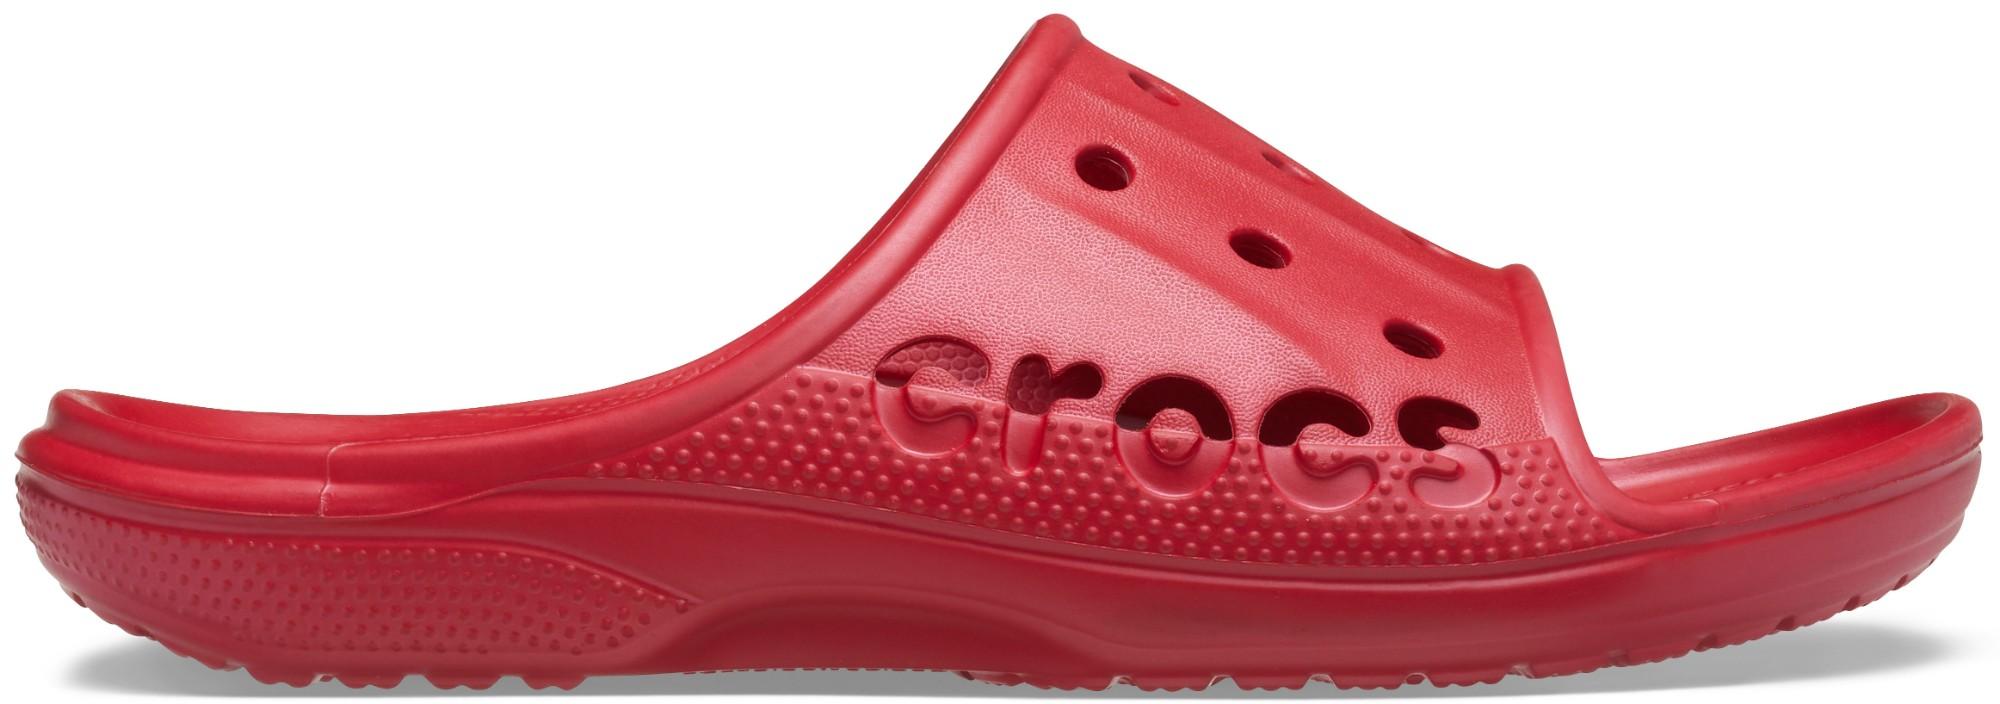 Crocs™ Baya Summer Slide Pepper 36,5